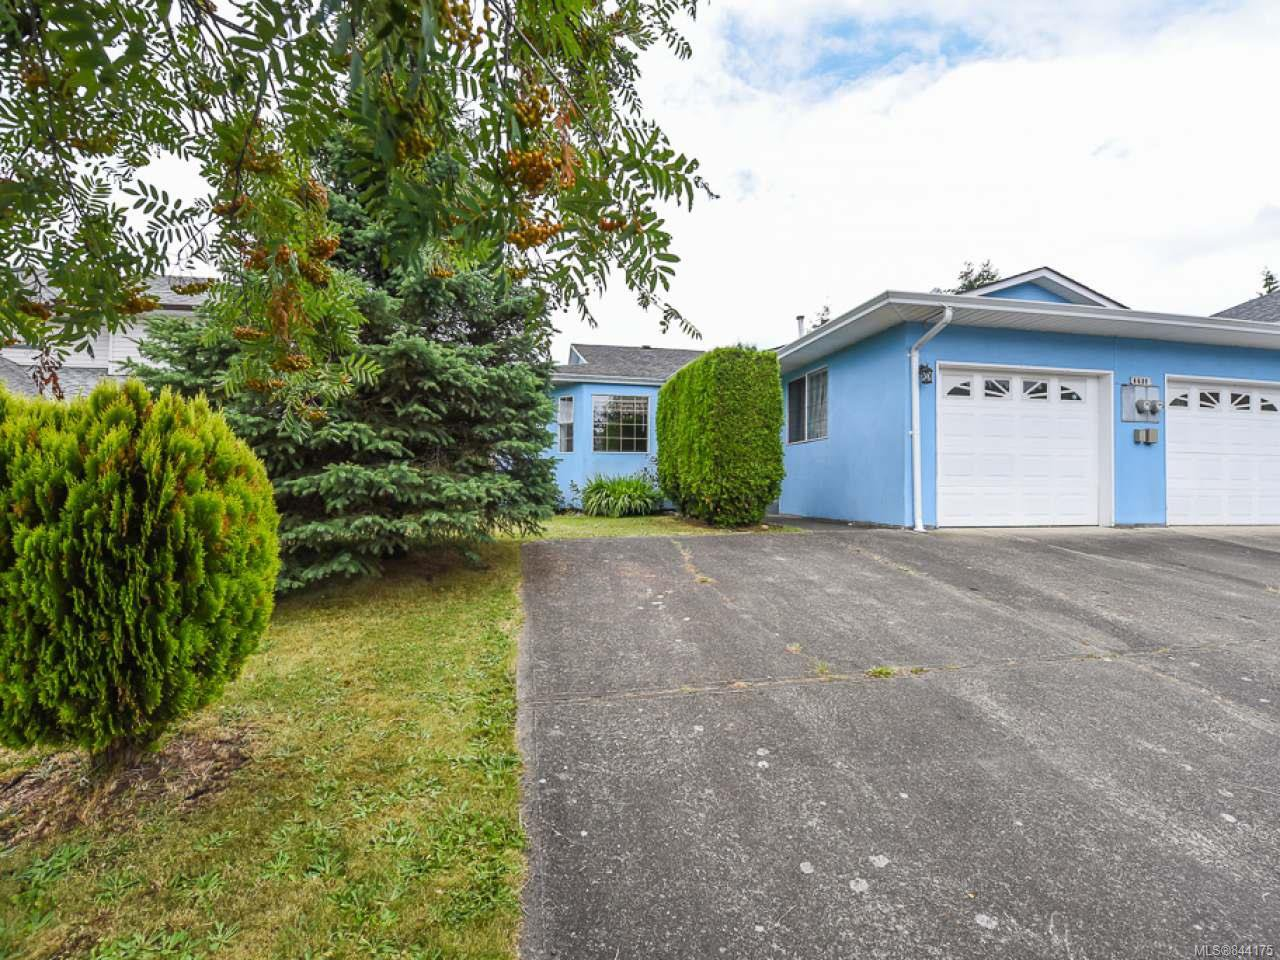 Main Photo: A 4689 Ashwood Pl in COURTENAY: CV Courtenay East Half Duplex for sale (Comox Valley)  : MLS®# 844175